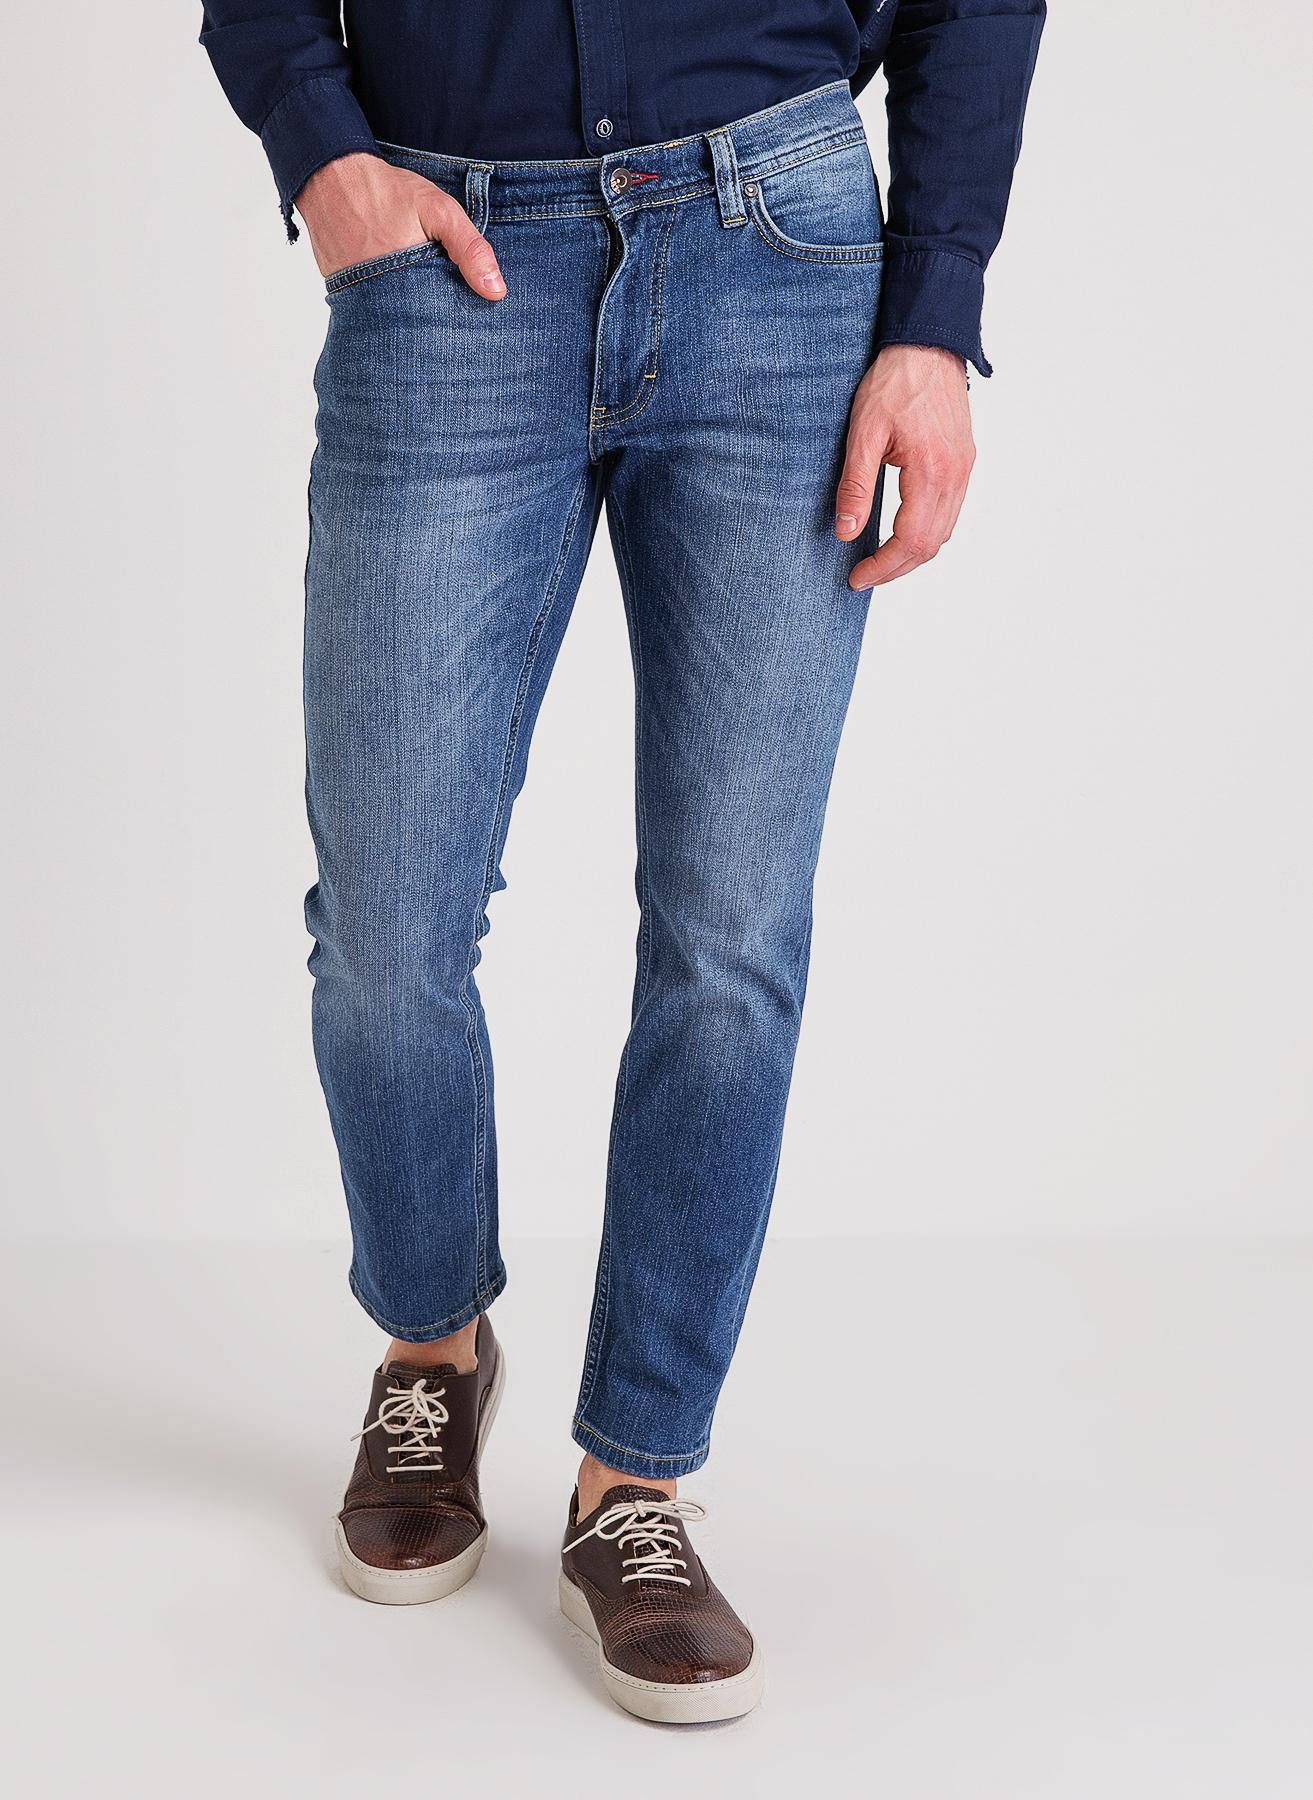 Mustang Slim Rise Mavi Klasik Pantolon 32-34 5000200016007 Ürün Resmi